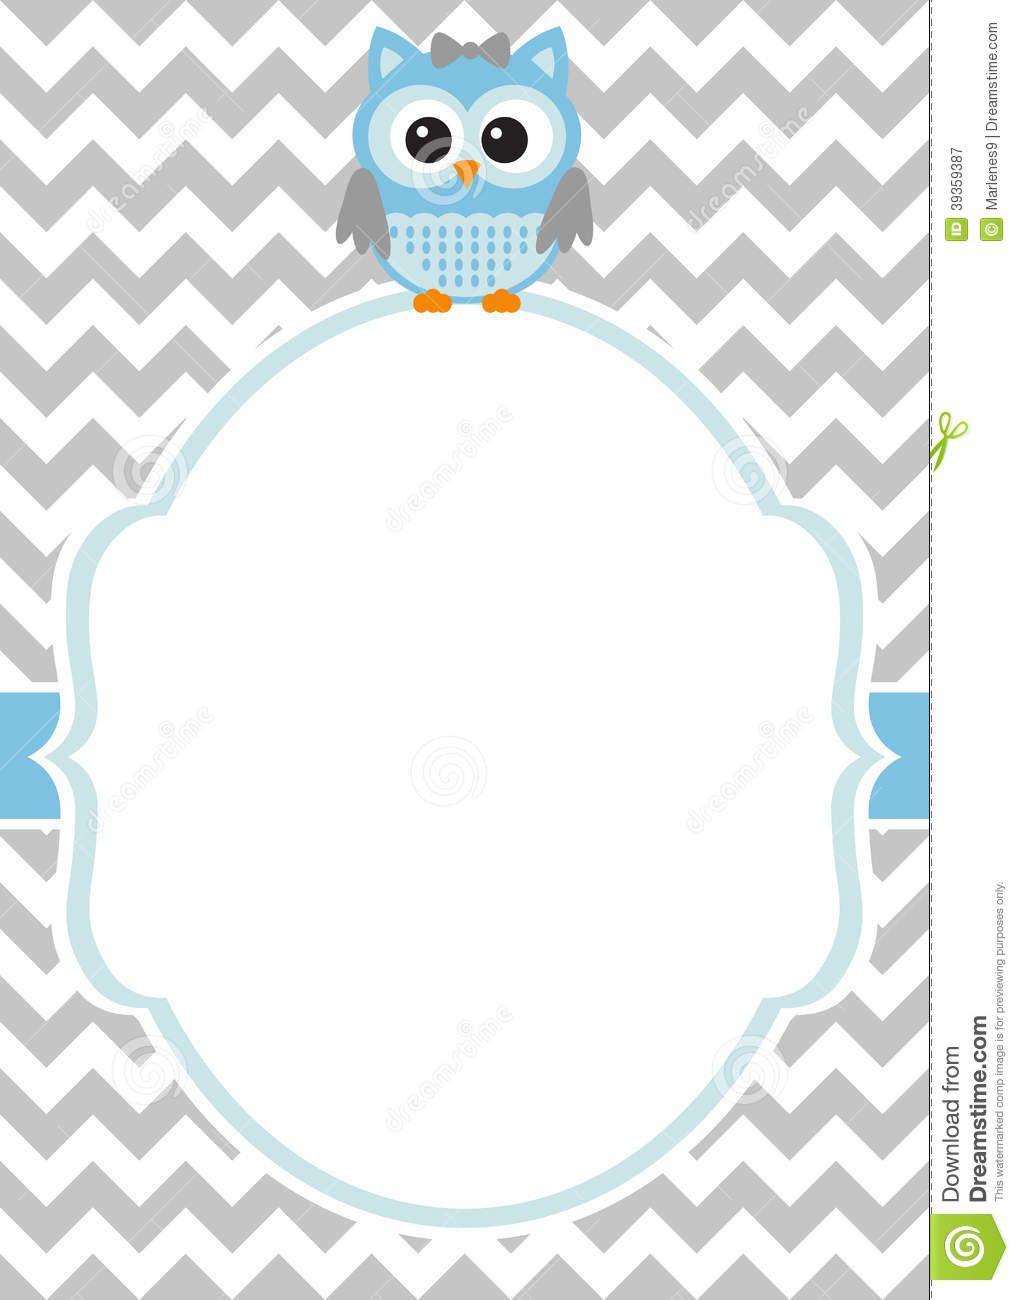 006 Sensational Free Printable Baby Shower Card For Boy Idea  BingoFull